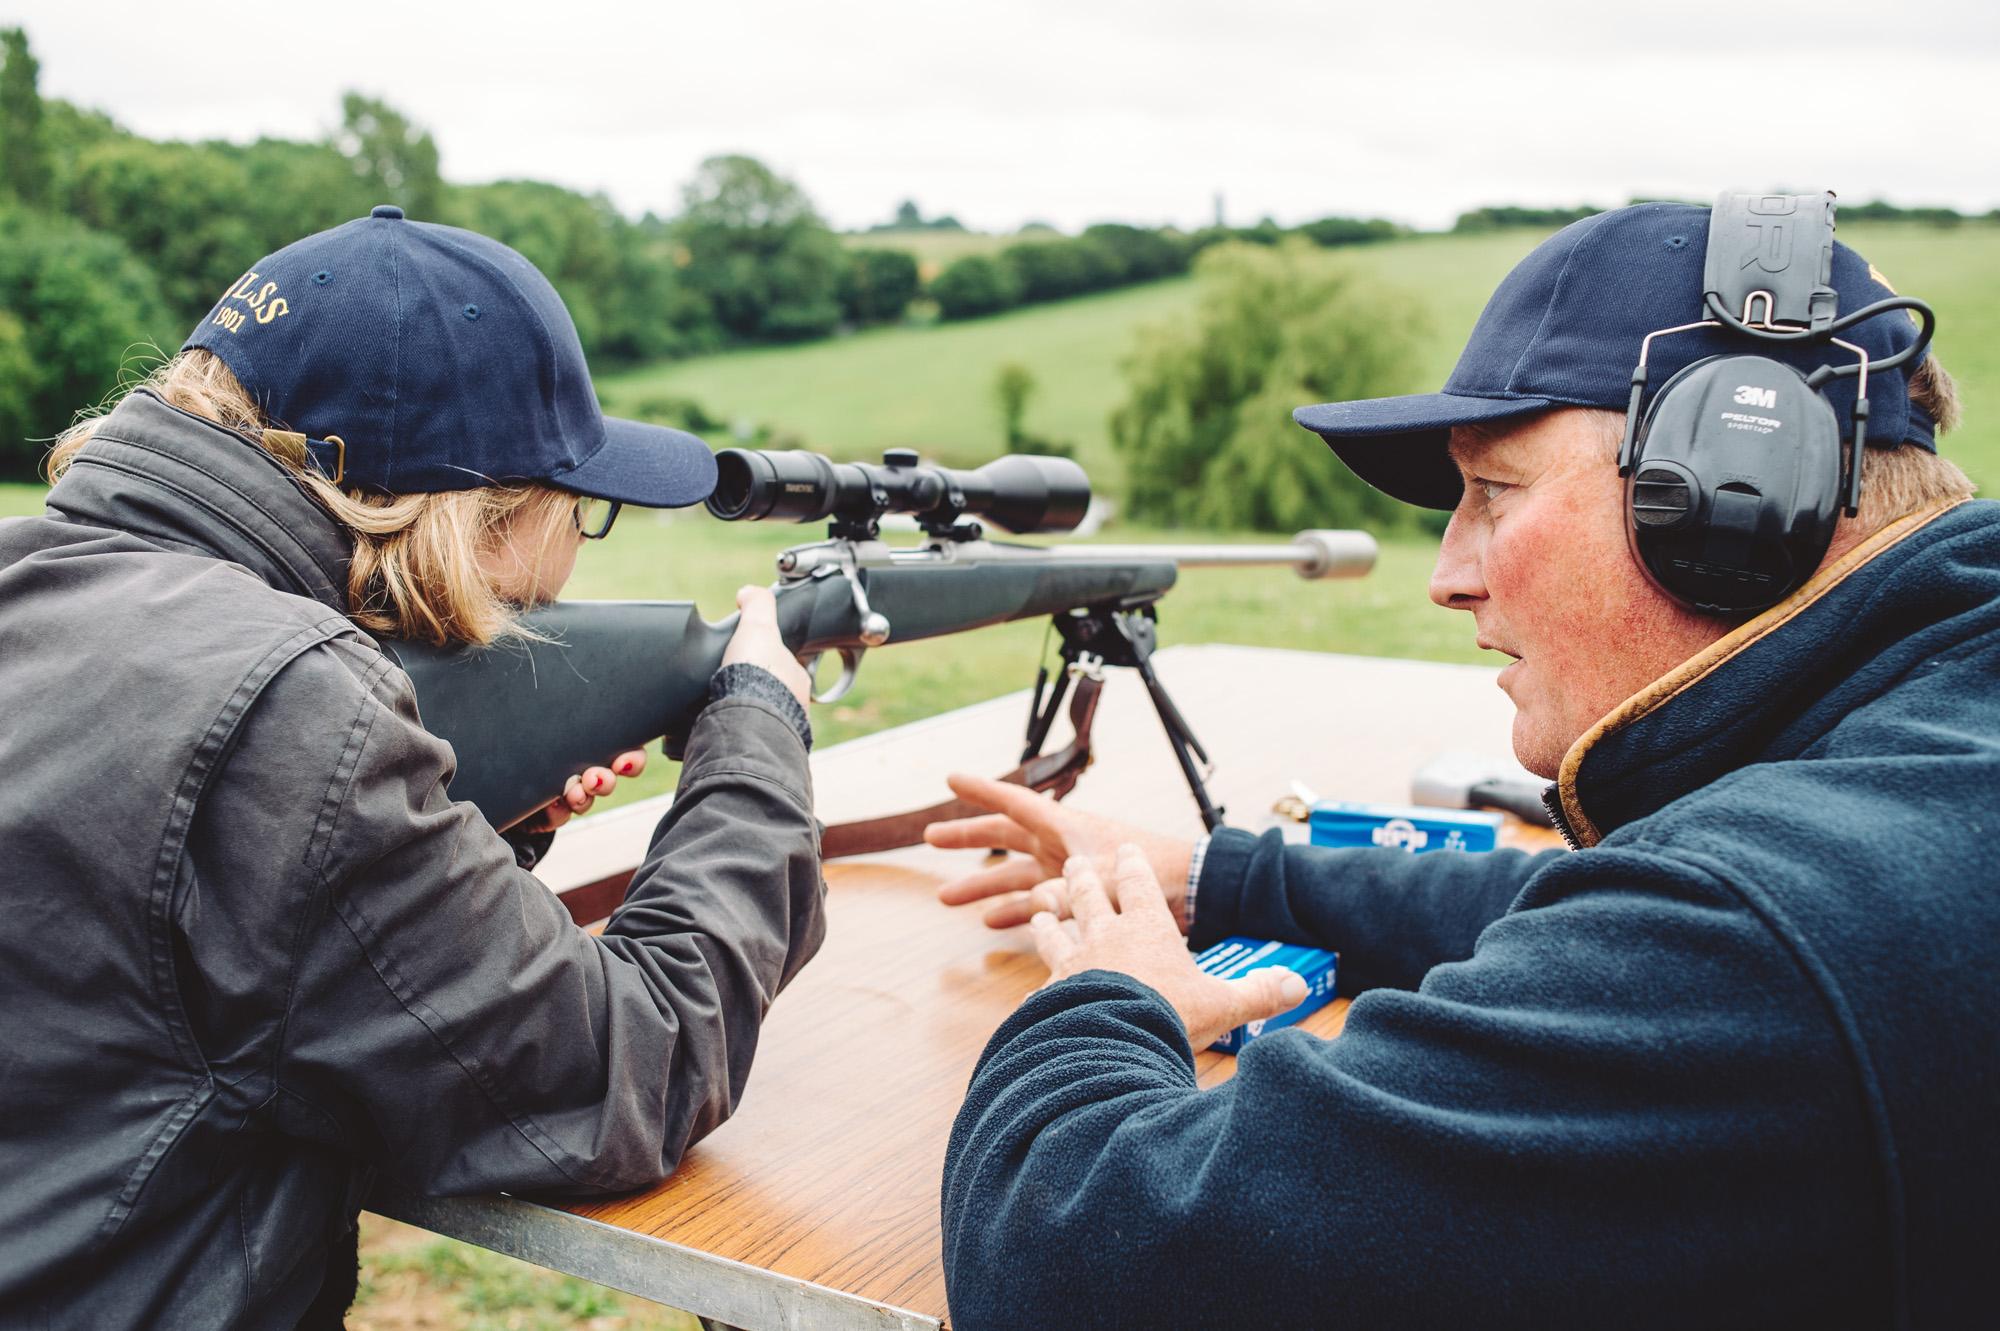 Teambuilding Deerstalking masterclass with West London Shooting School credit Justine Trickett